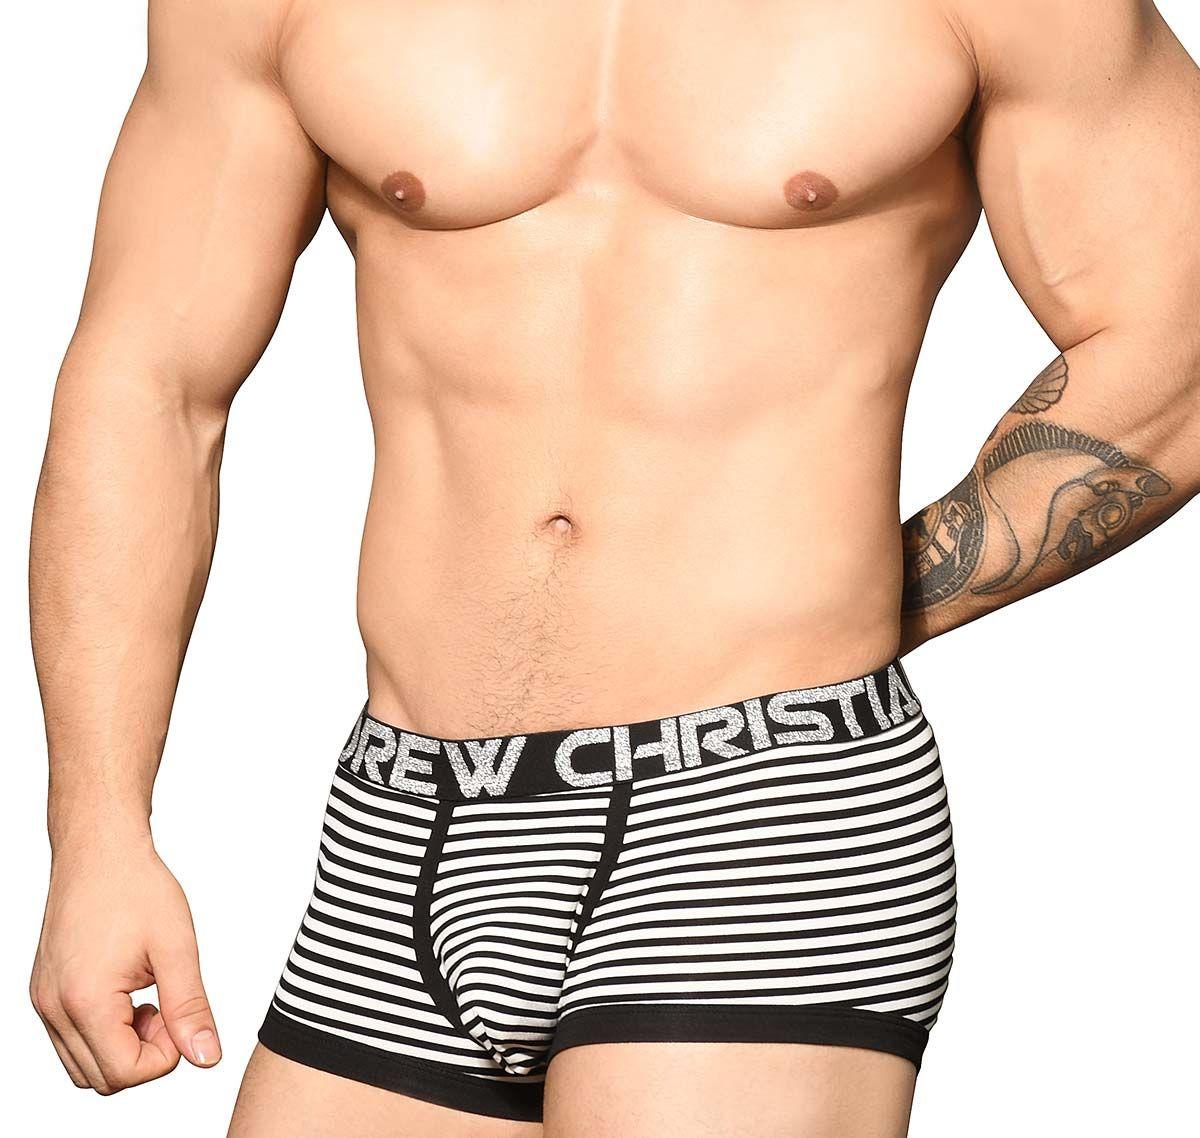 Andrew Christian Boxers PRIMARY STRIPE BOXER w/ Almost Naked 91685, black-white